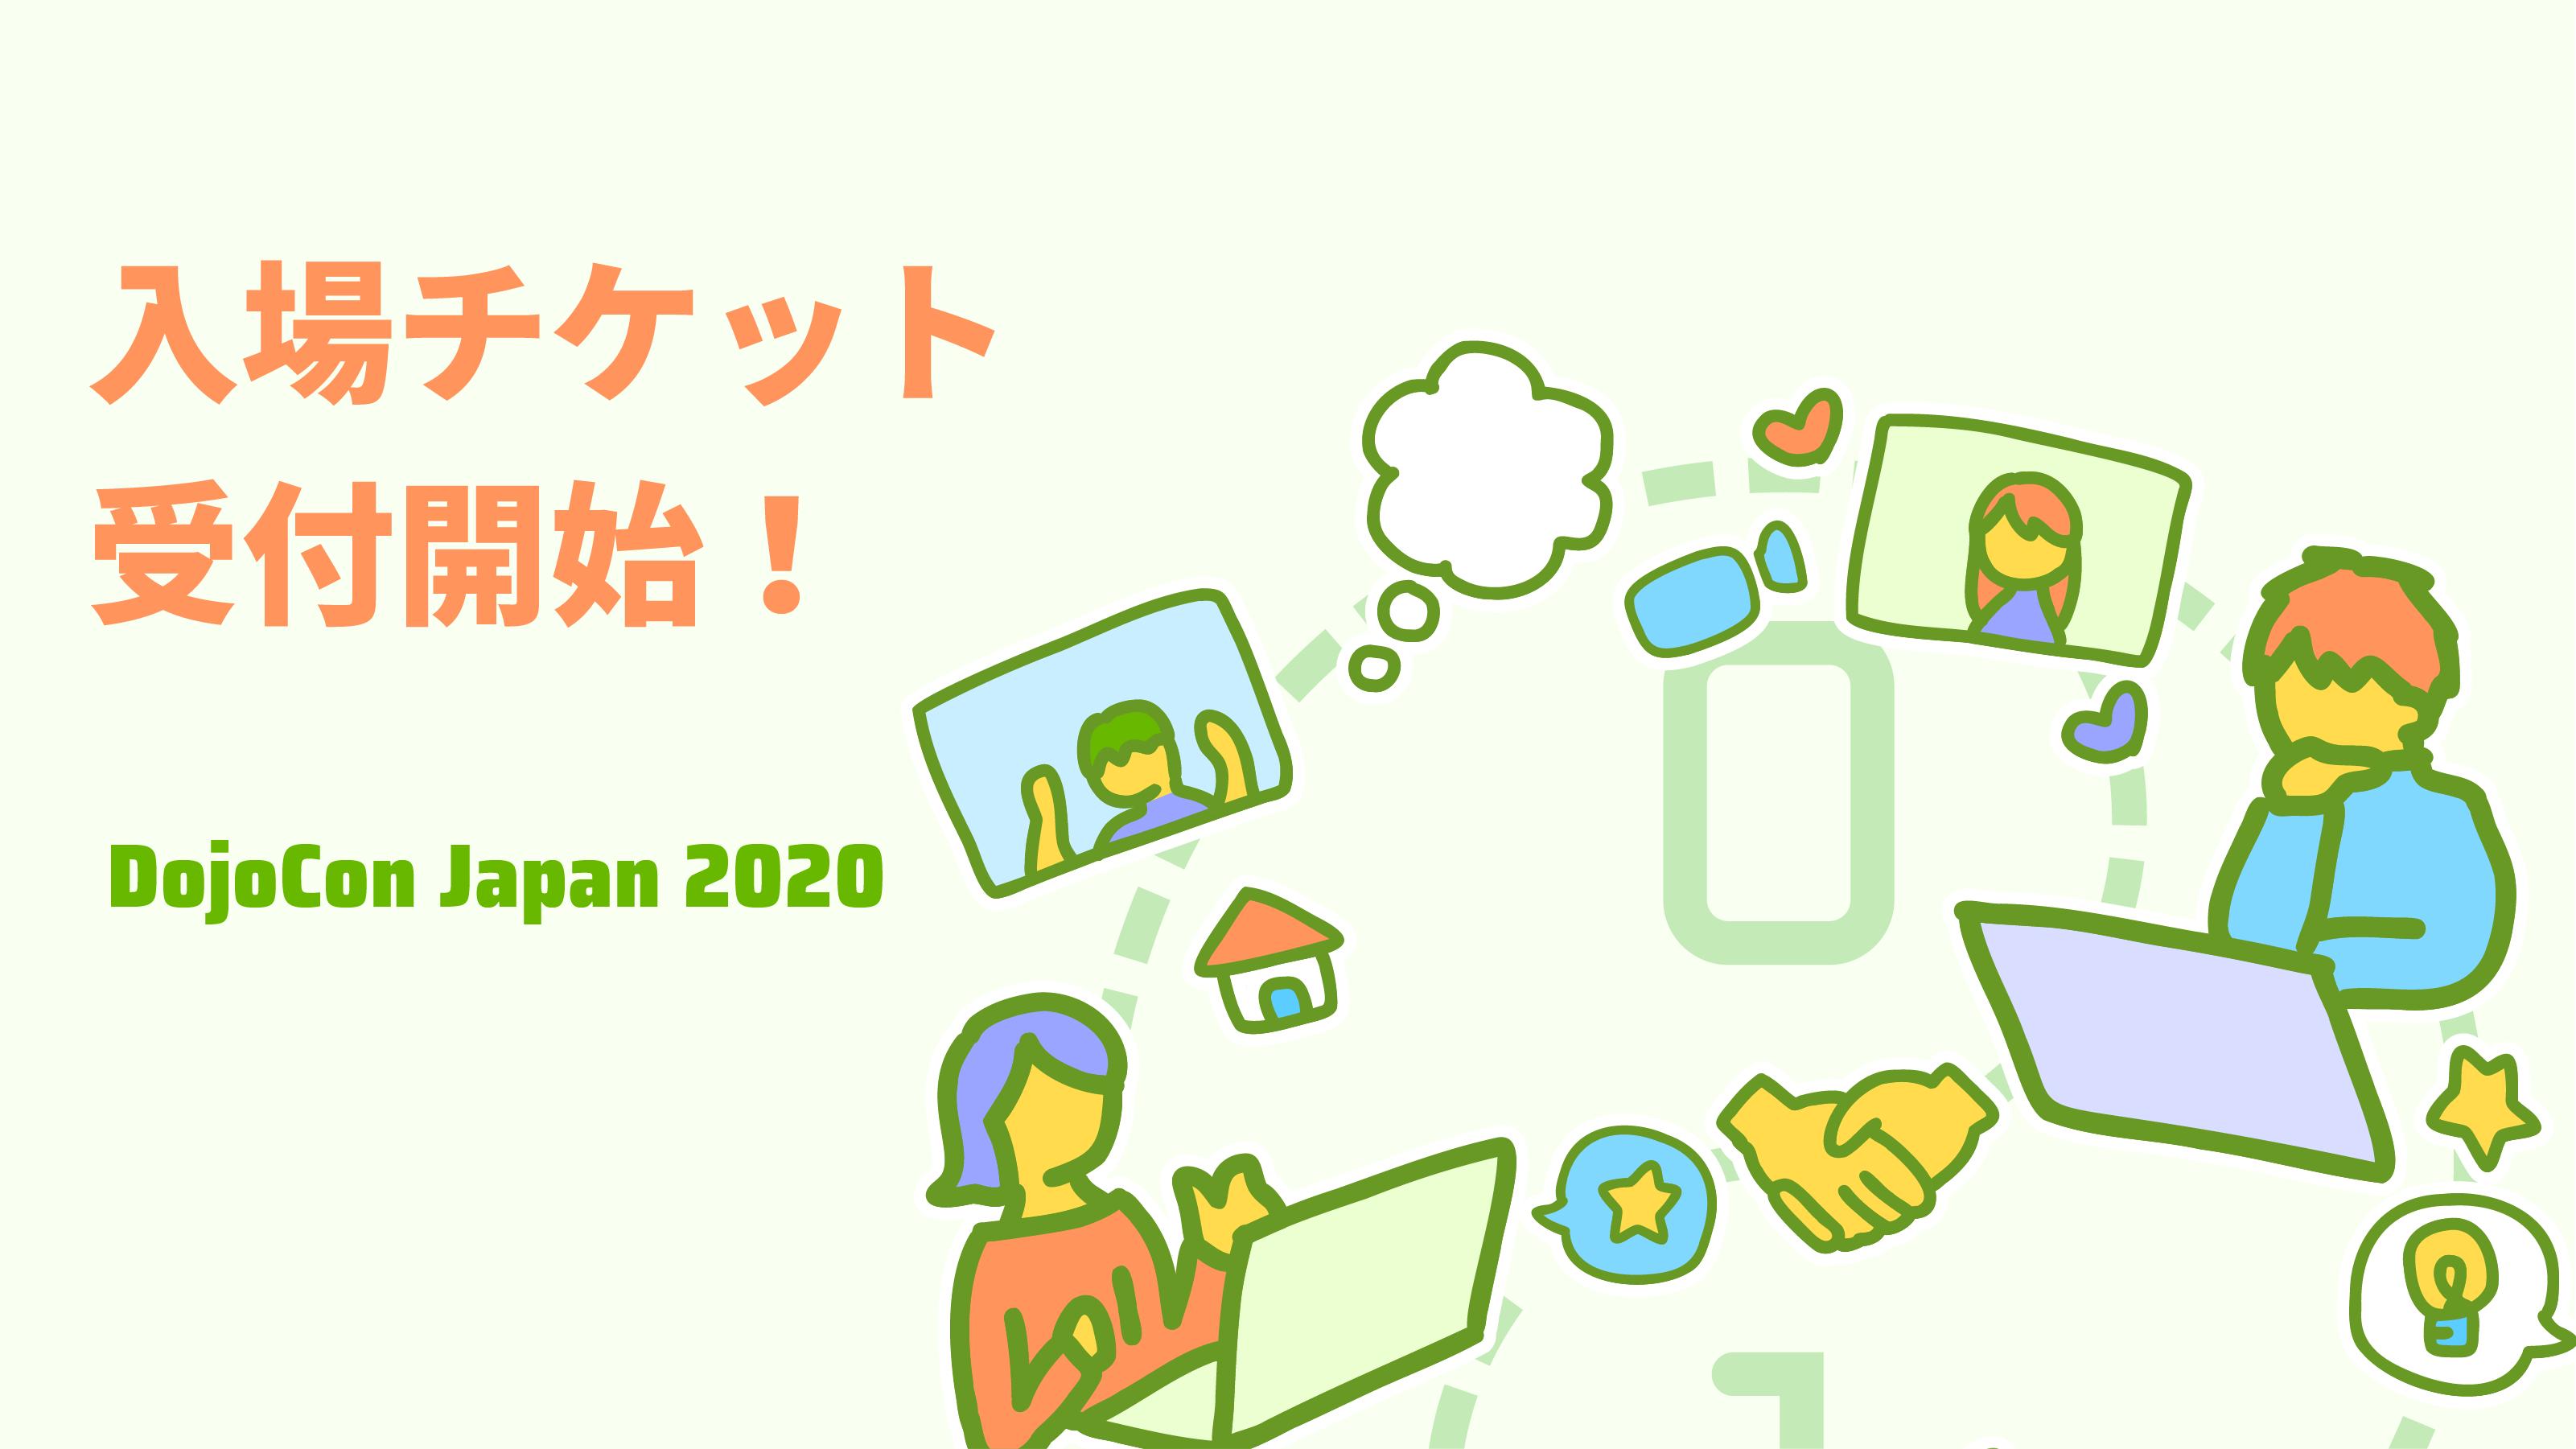 thumbnail of 入場チケット受付開始のお知らせ